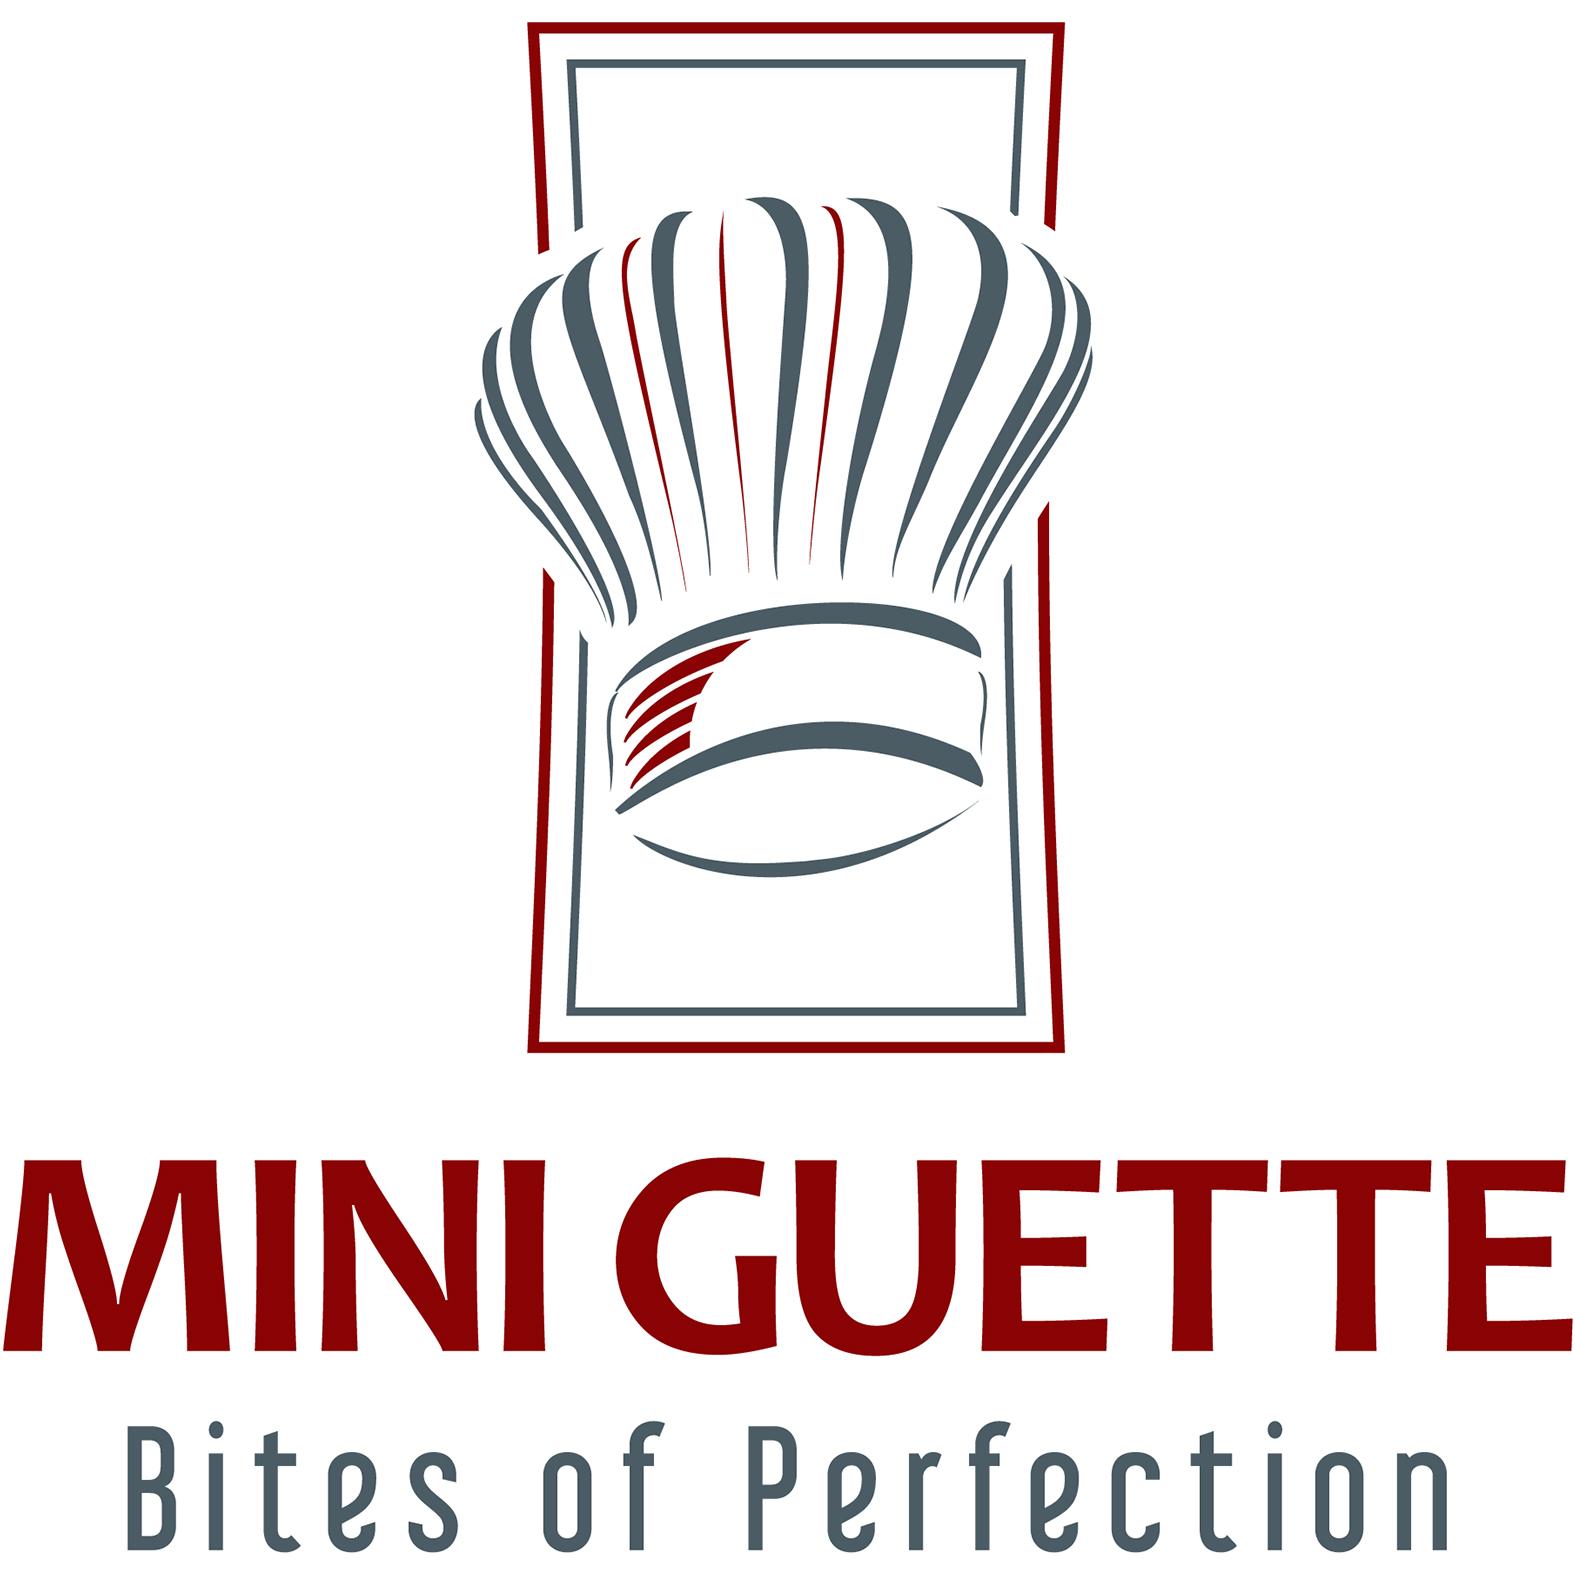 Miniguette